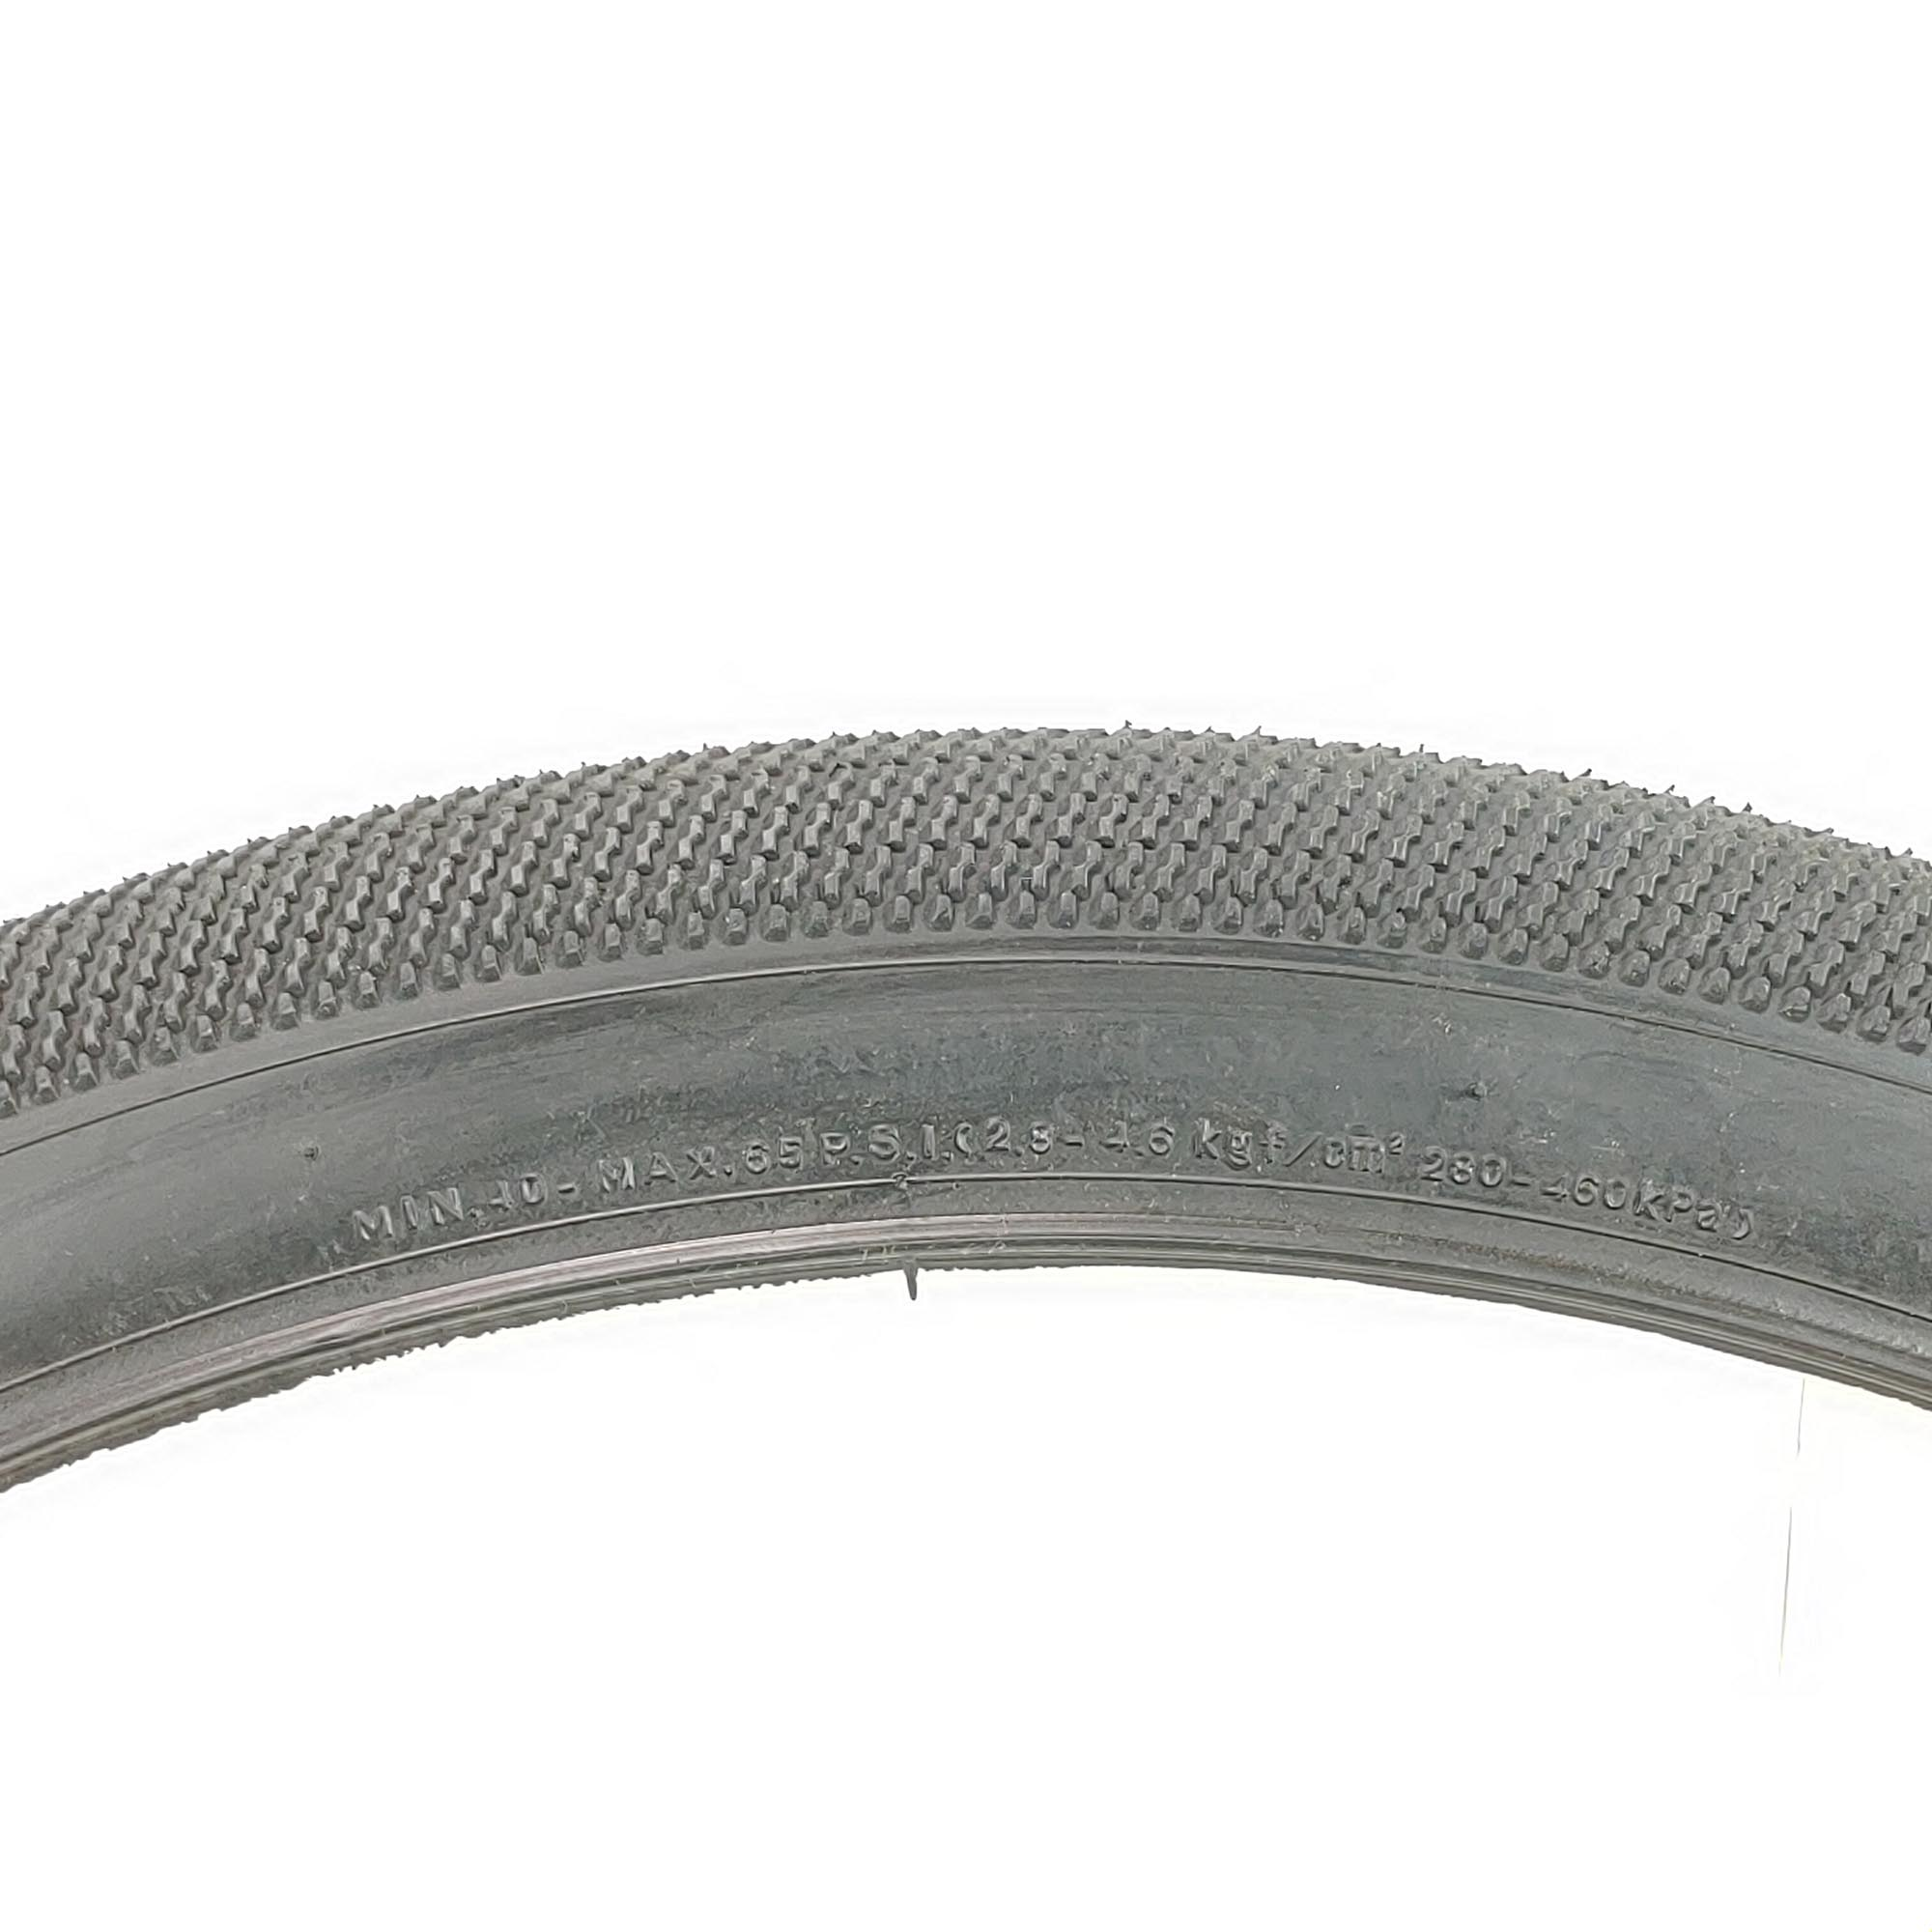 Pneu de Bicicleta Aro 29 Vee Rubber 2.10 Micro Knob